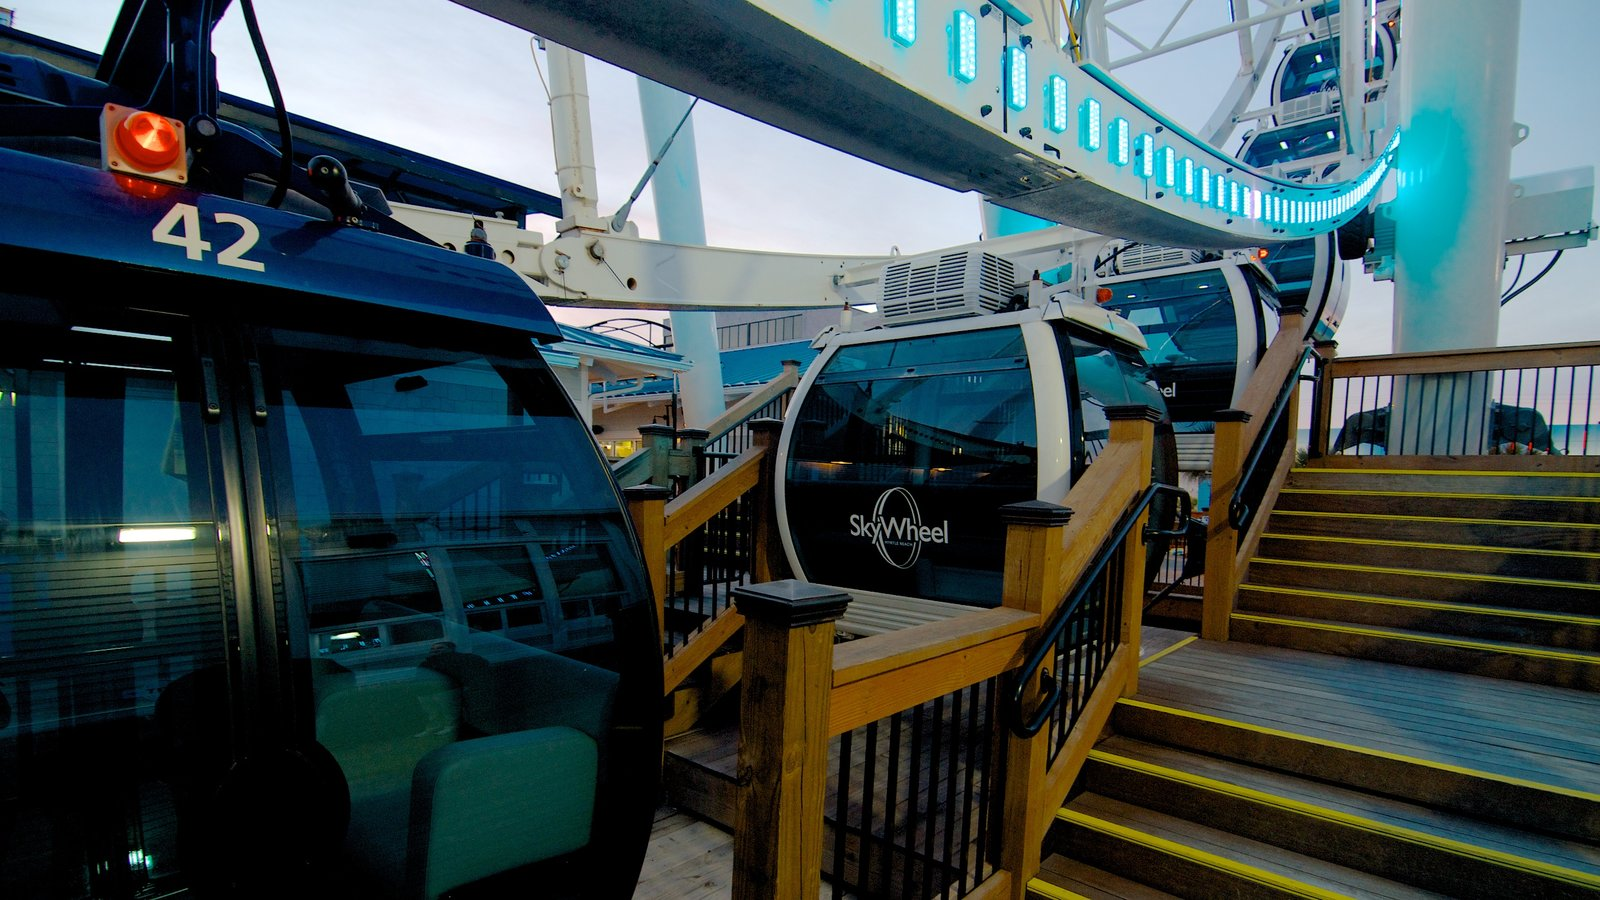 Skywheel Myrtle Beach Which Includes A Gondola